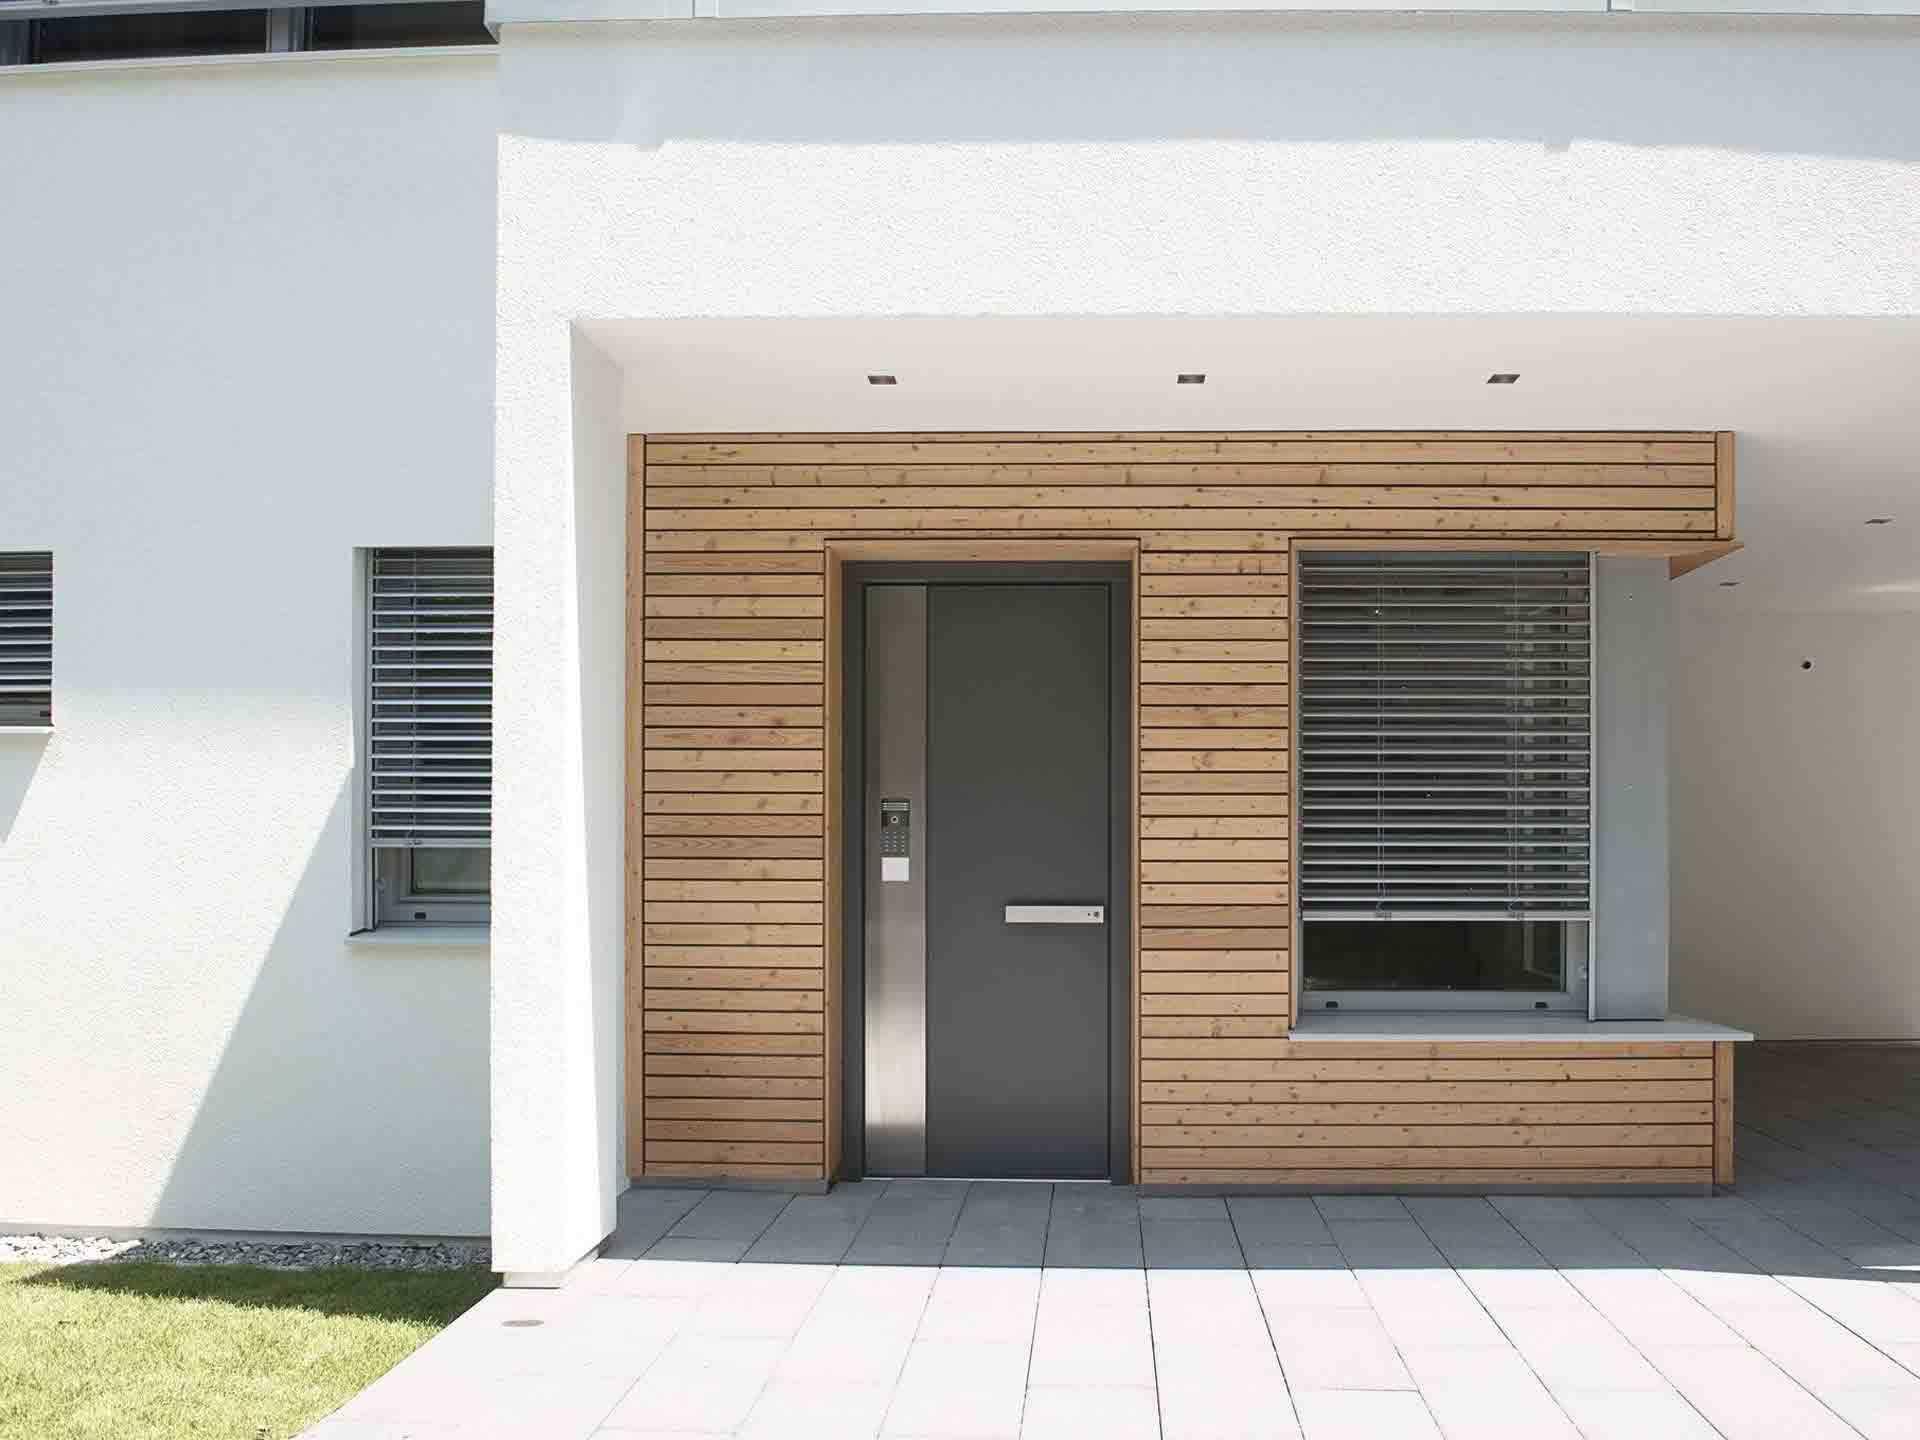 Musterhaus CityLife  Haus 700 in RheinauLinx  WeberHaus